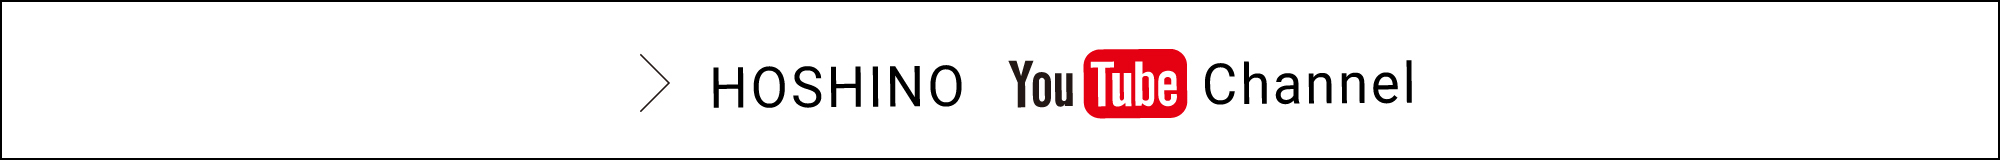 &HOSHINO channel youtube